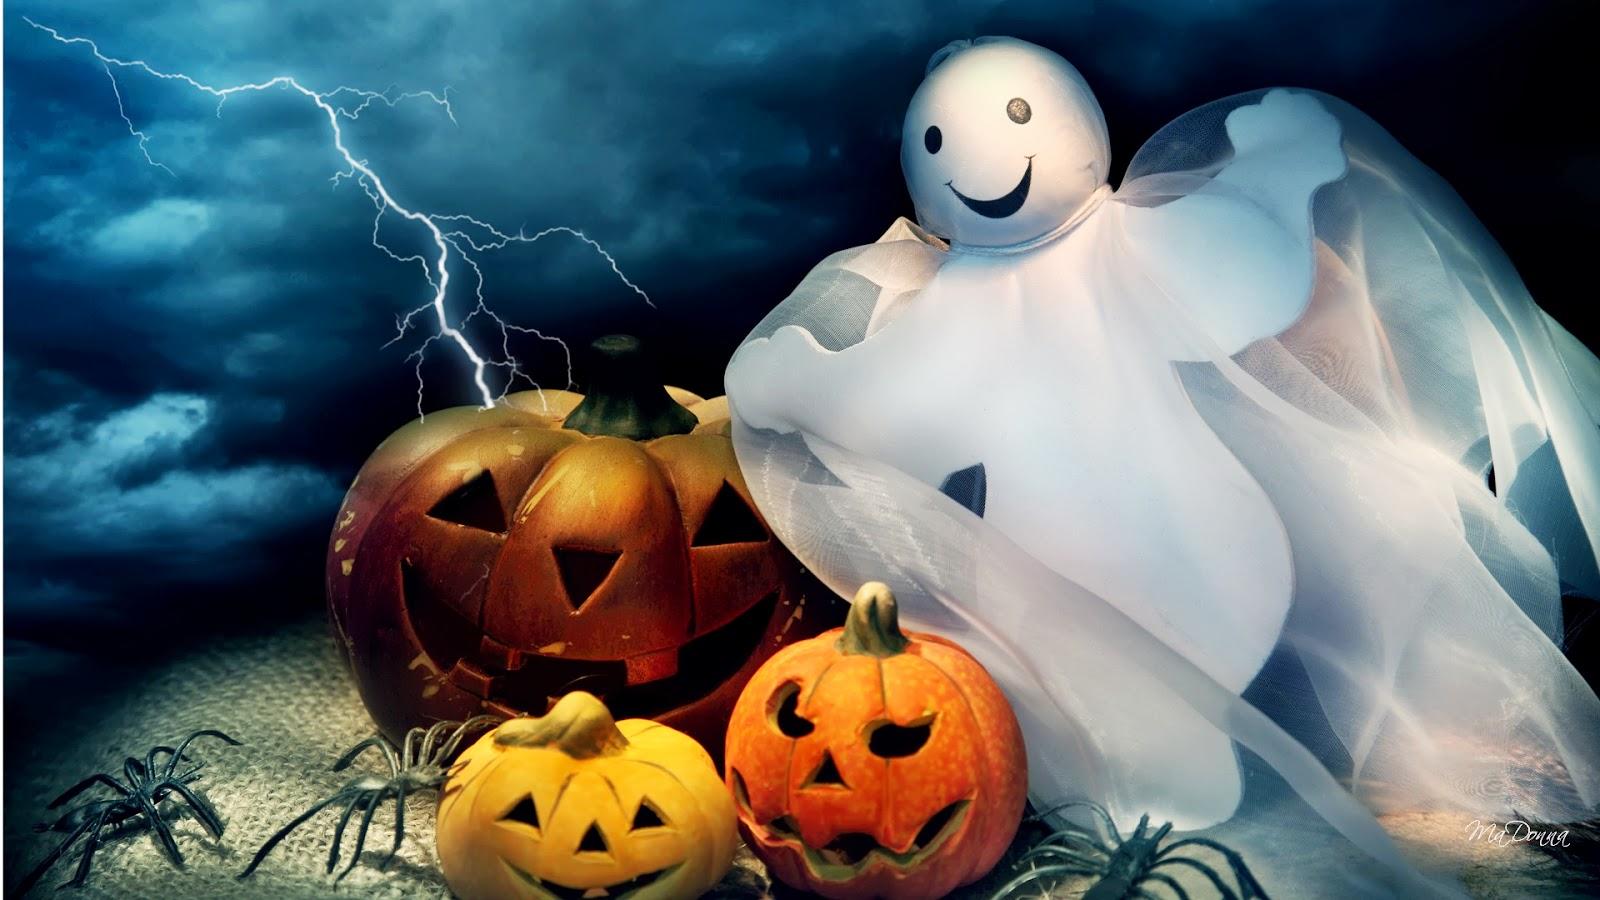 Desktop Wallpaper Halloween Wallpaper Backgrounds 1600x900